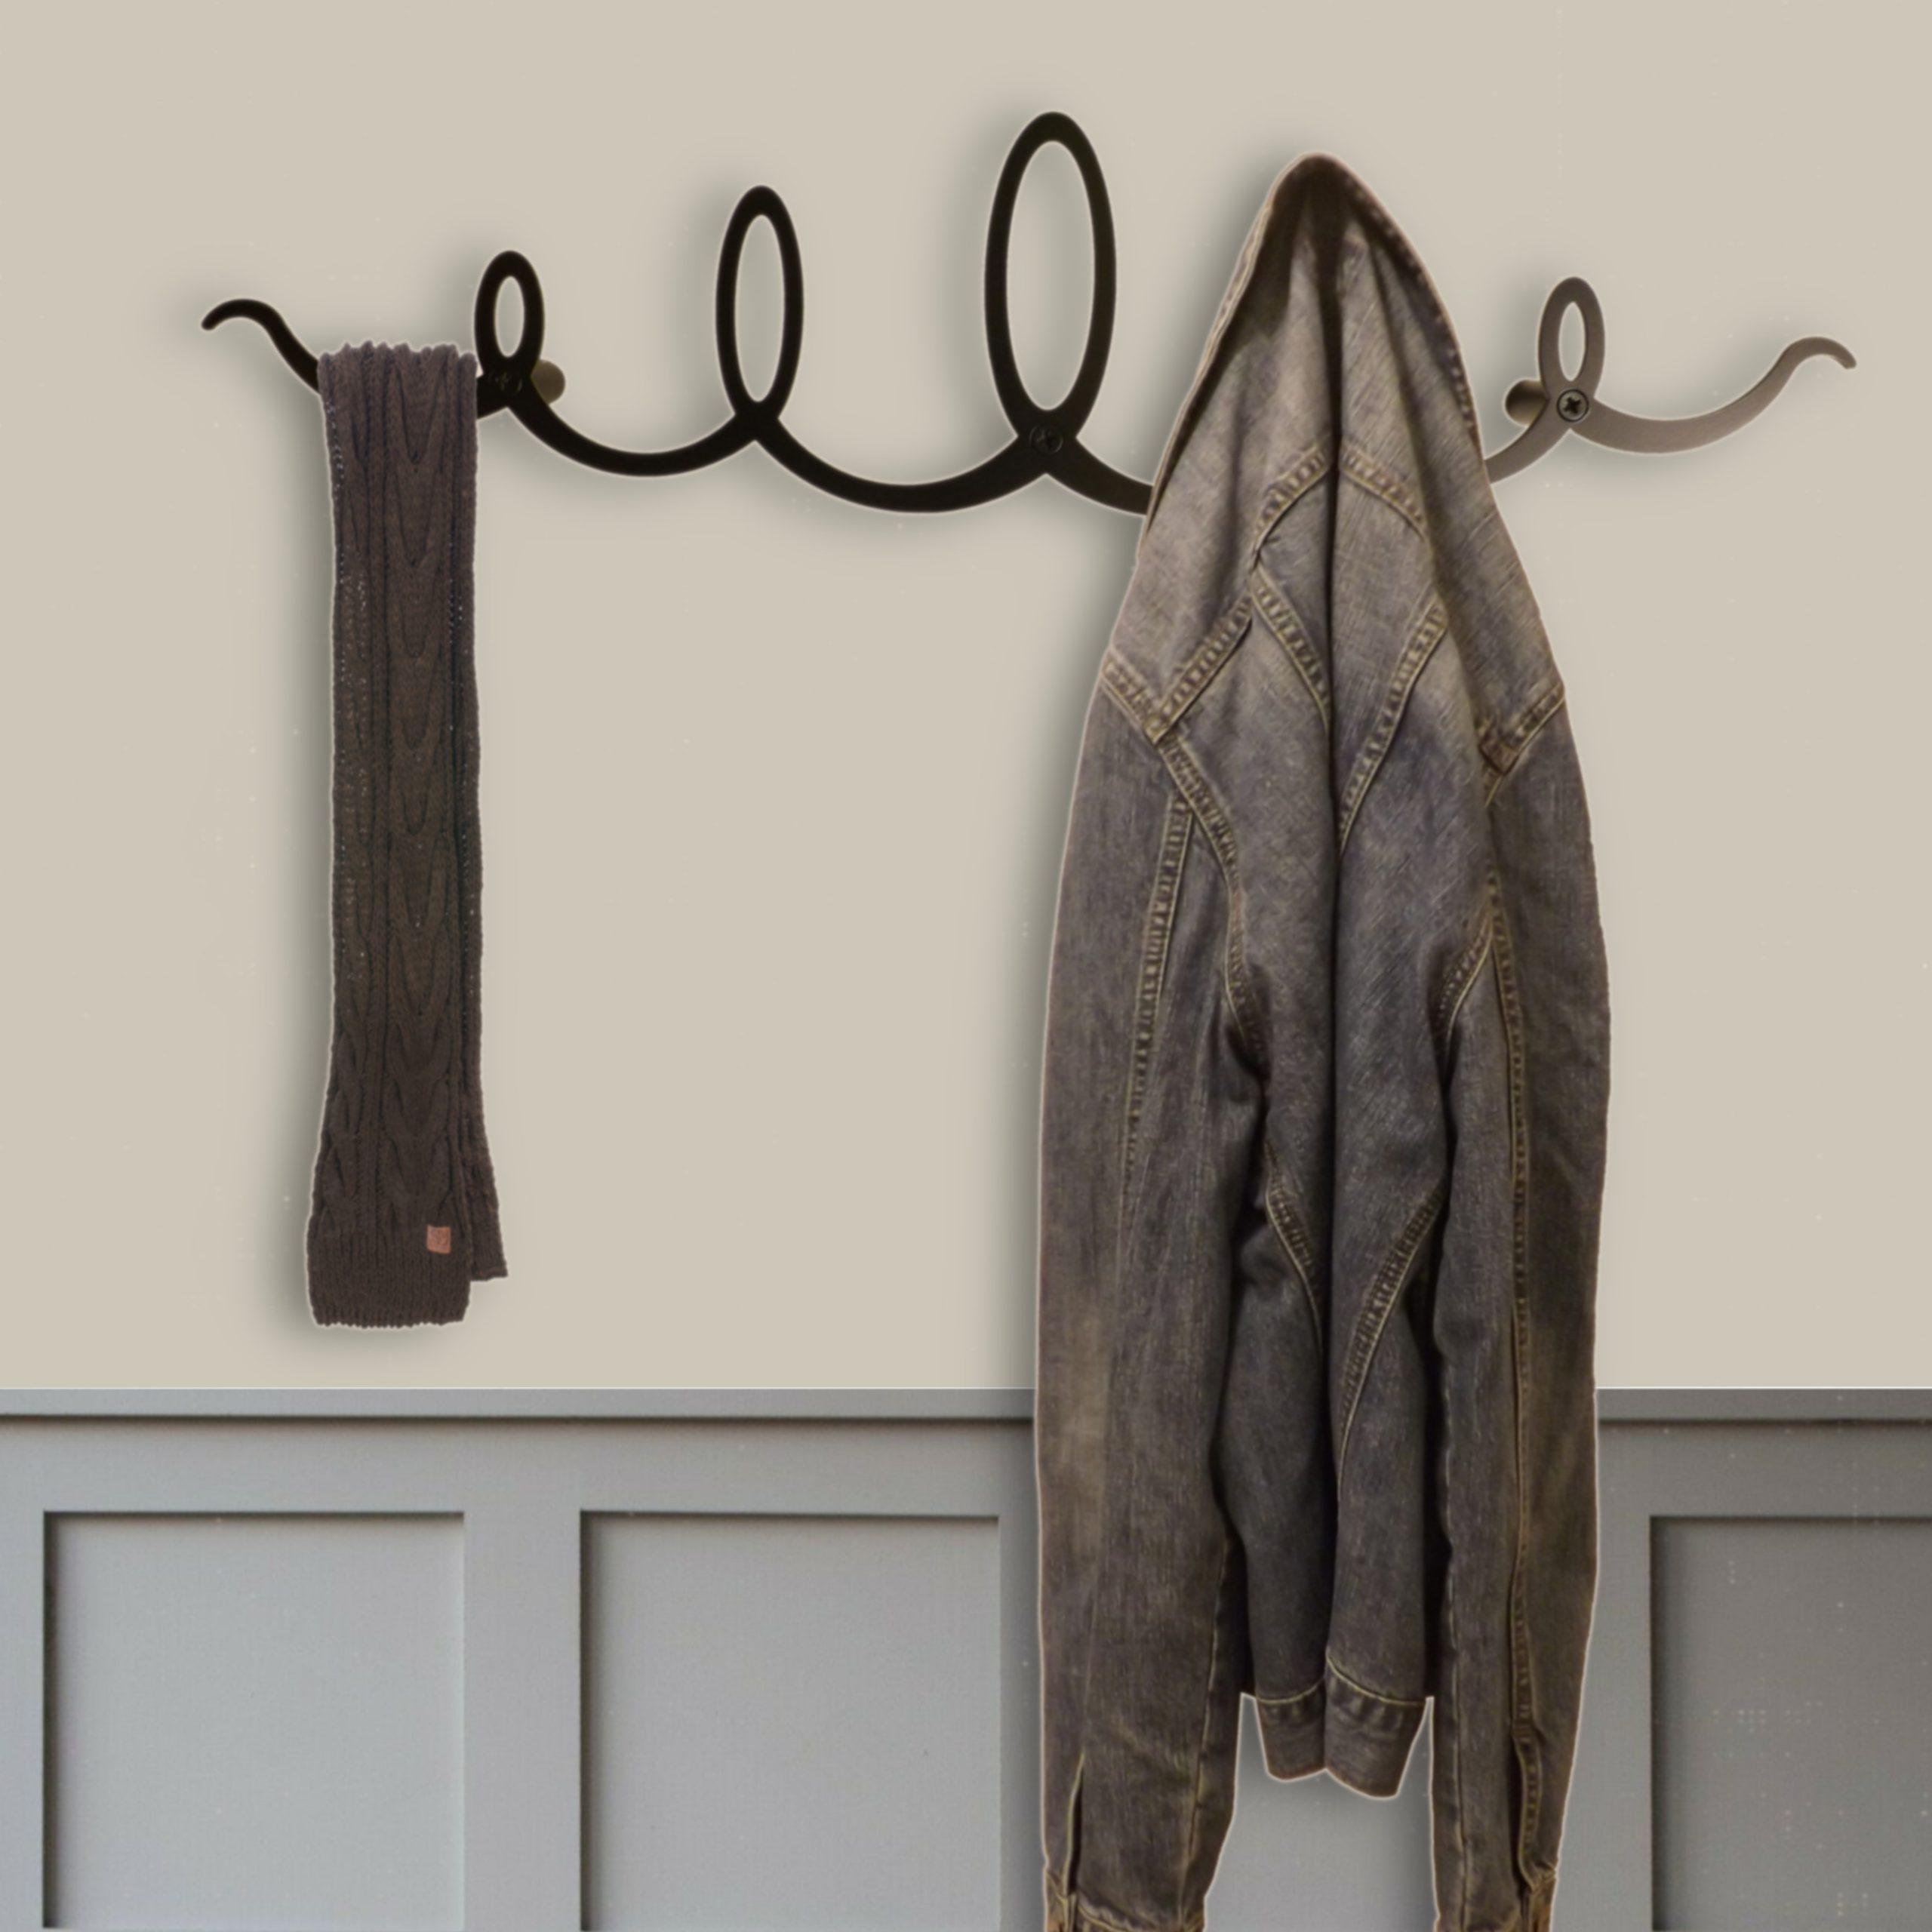 Black Squiggle Coat Rack